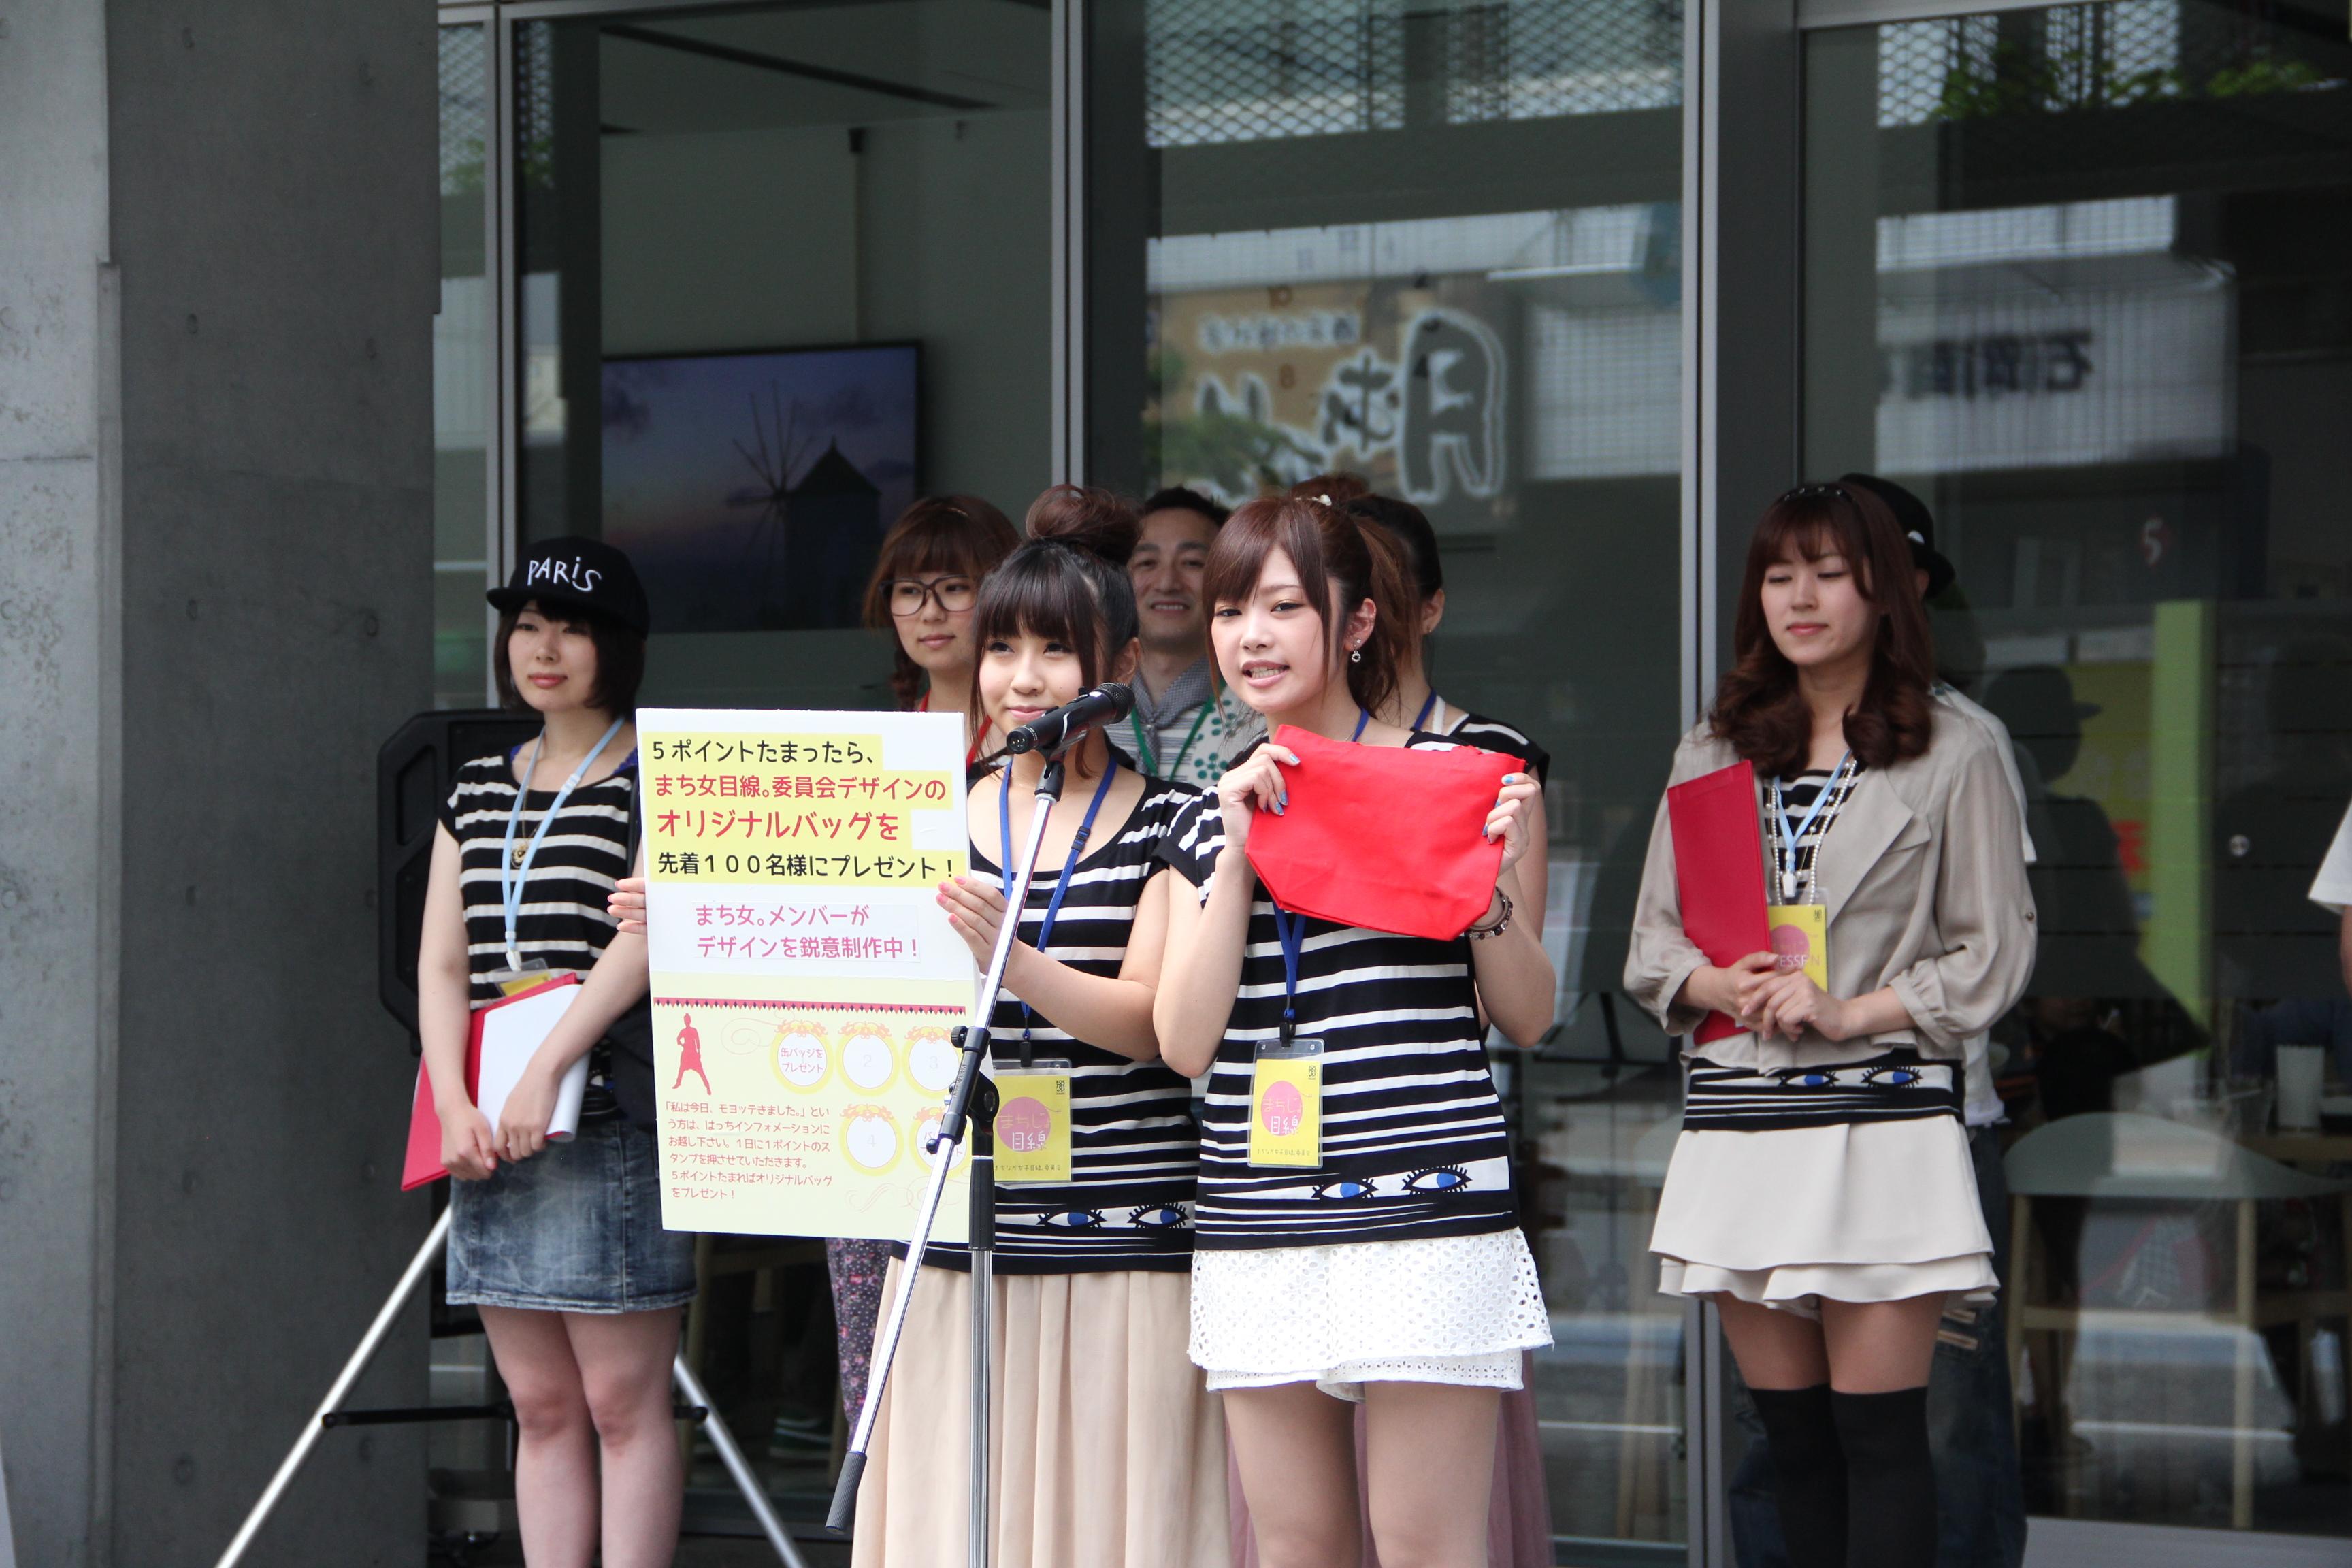 http://hacchi.jp/blog/upload/images/%E7%94%BB%E5%83%8F2.JPG